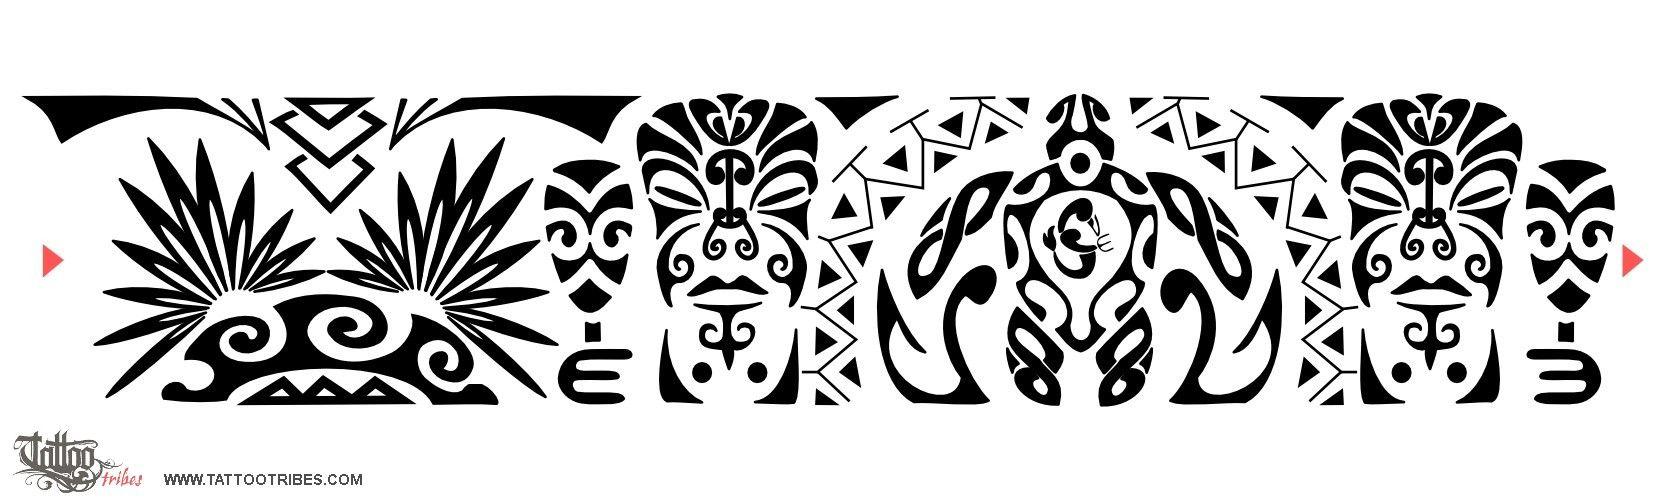 polynesian designs and patterns | Maori Samoan Armband Tattoojpg